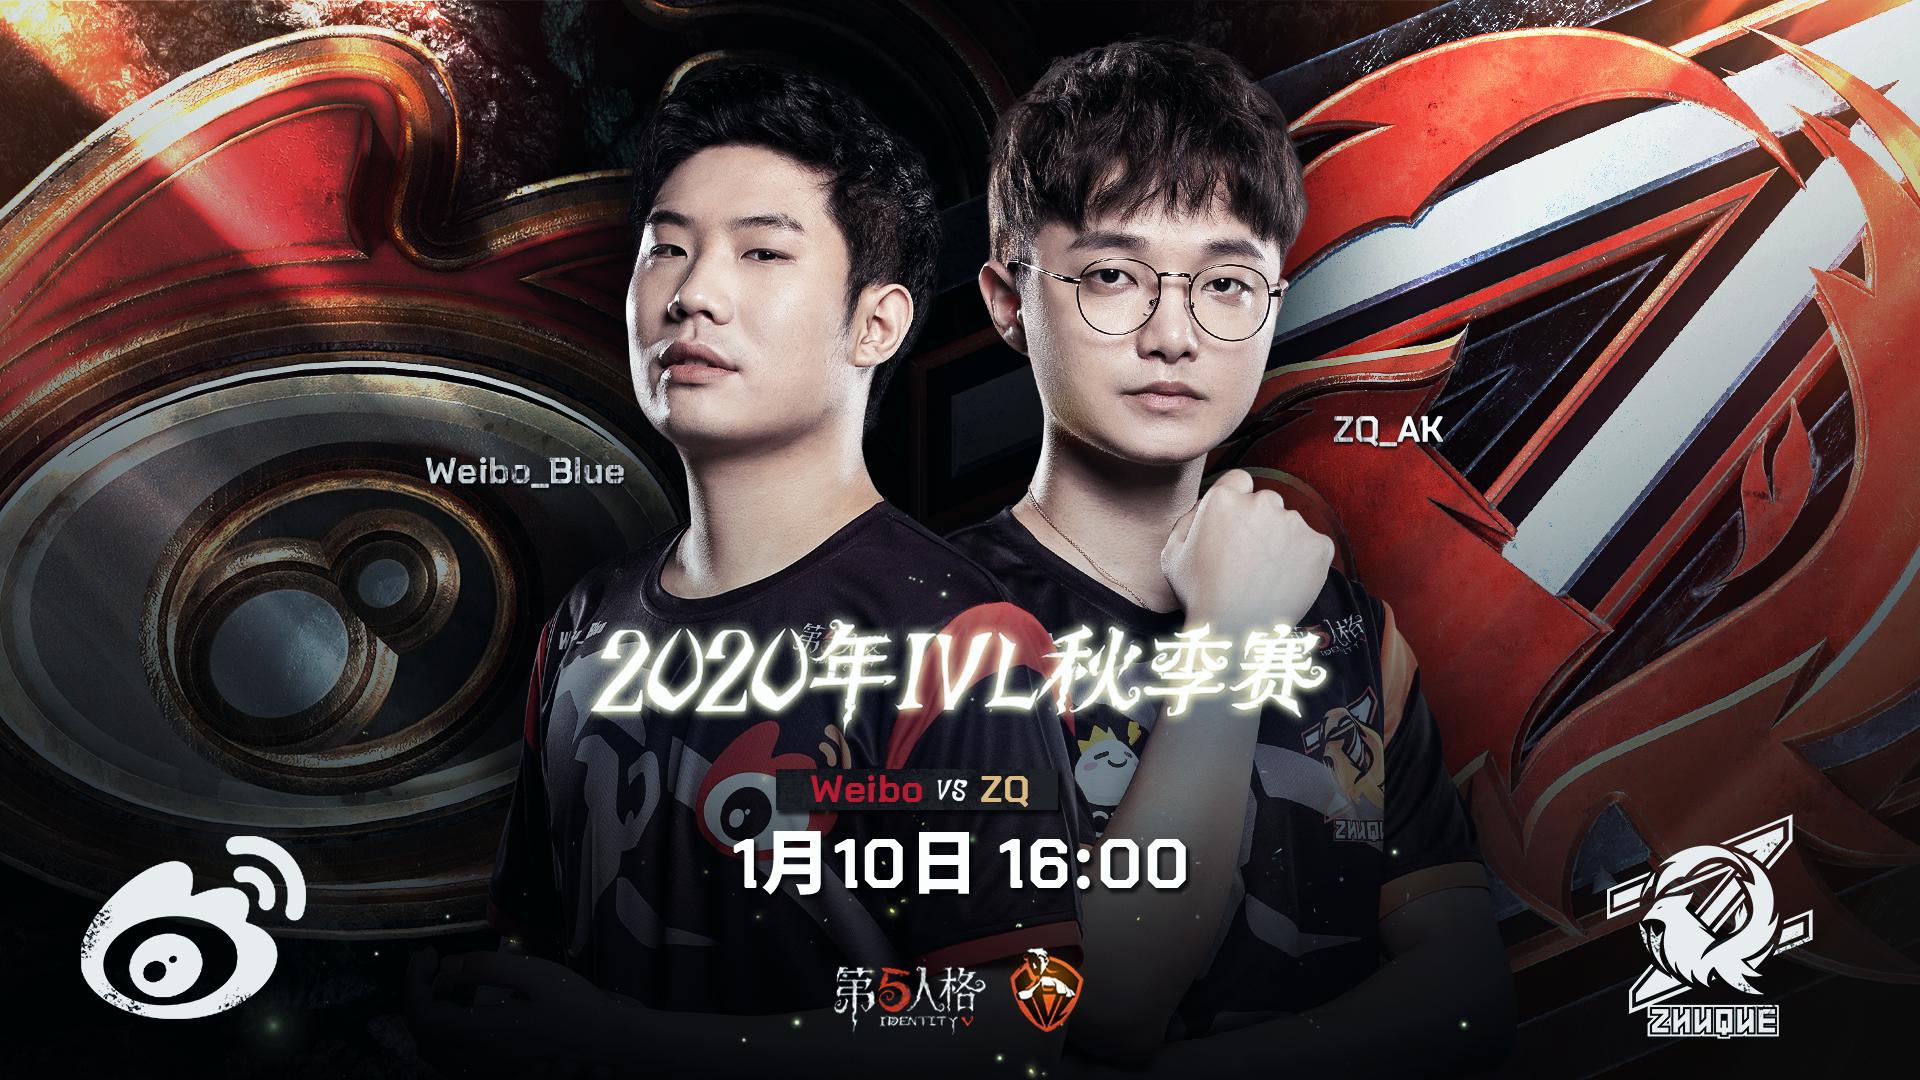 【2020IVL】秋季赛总决赛Day3录像 Weibo vs ZQ